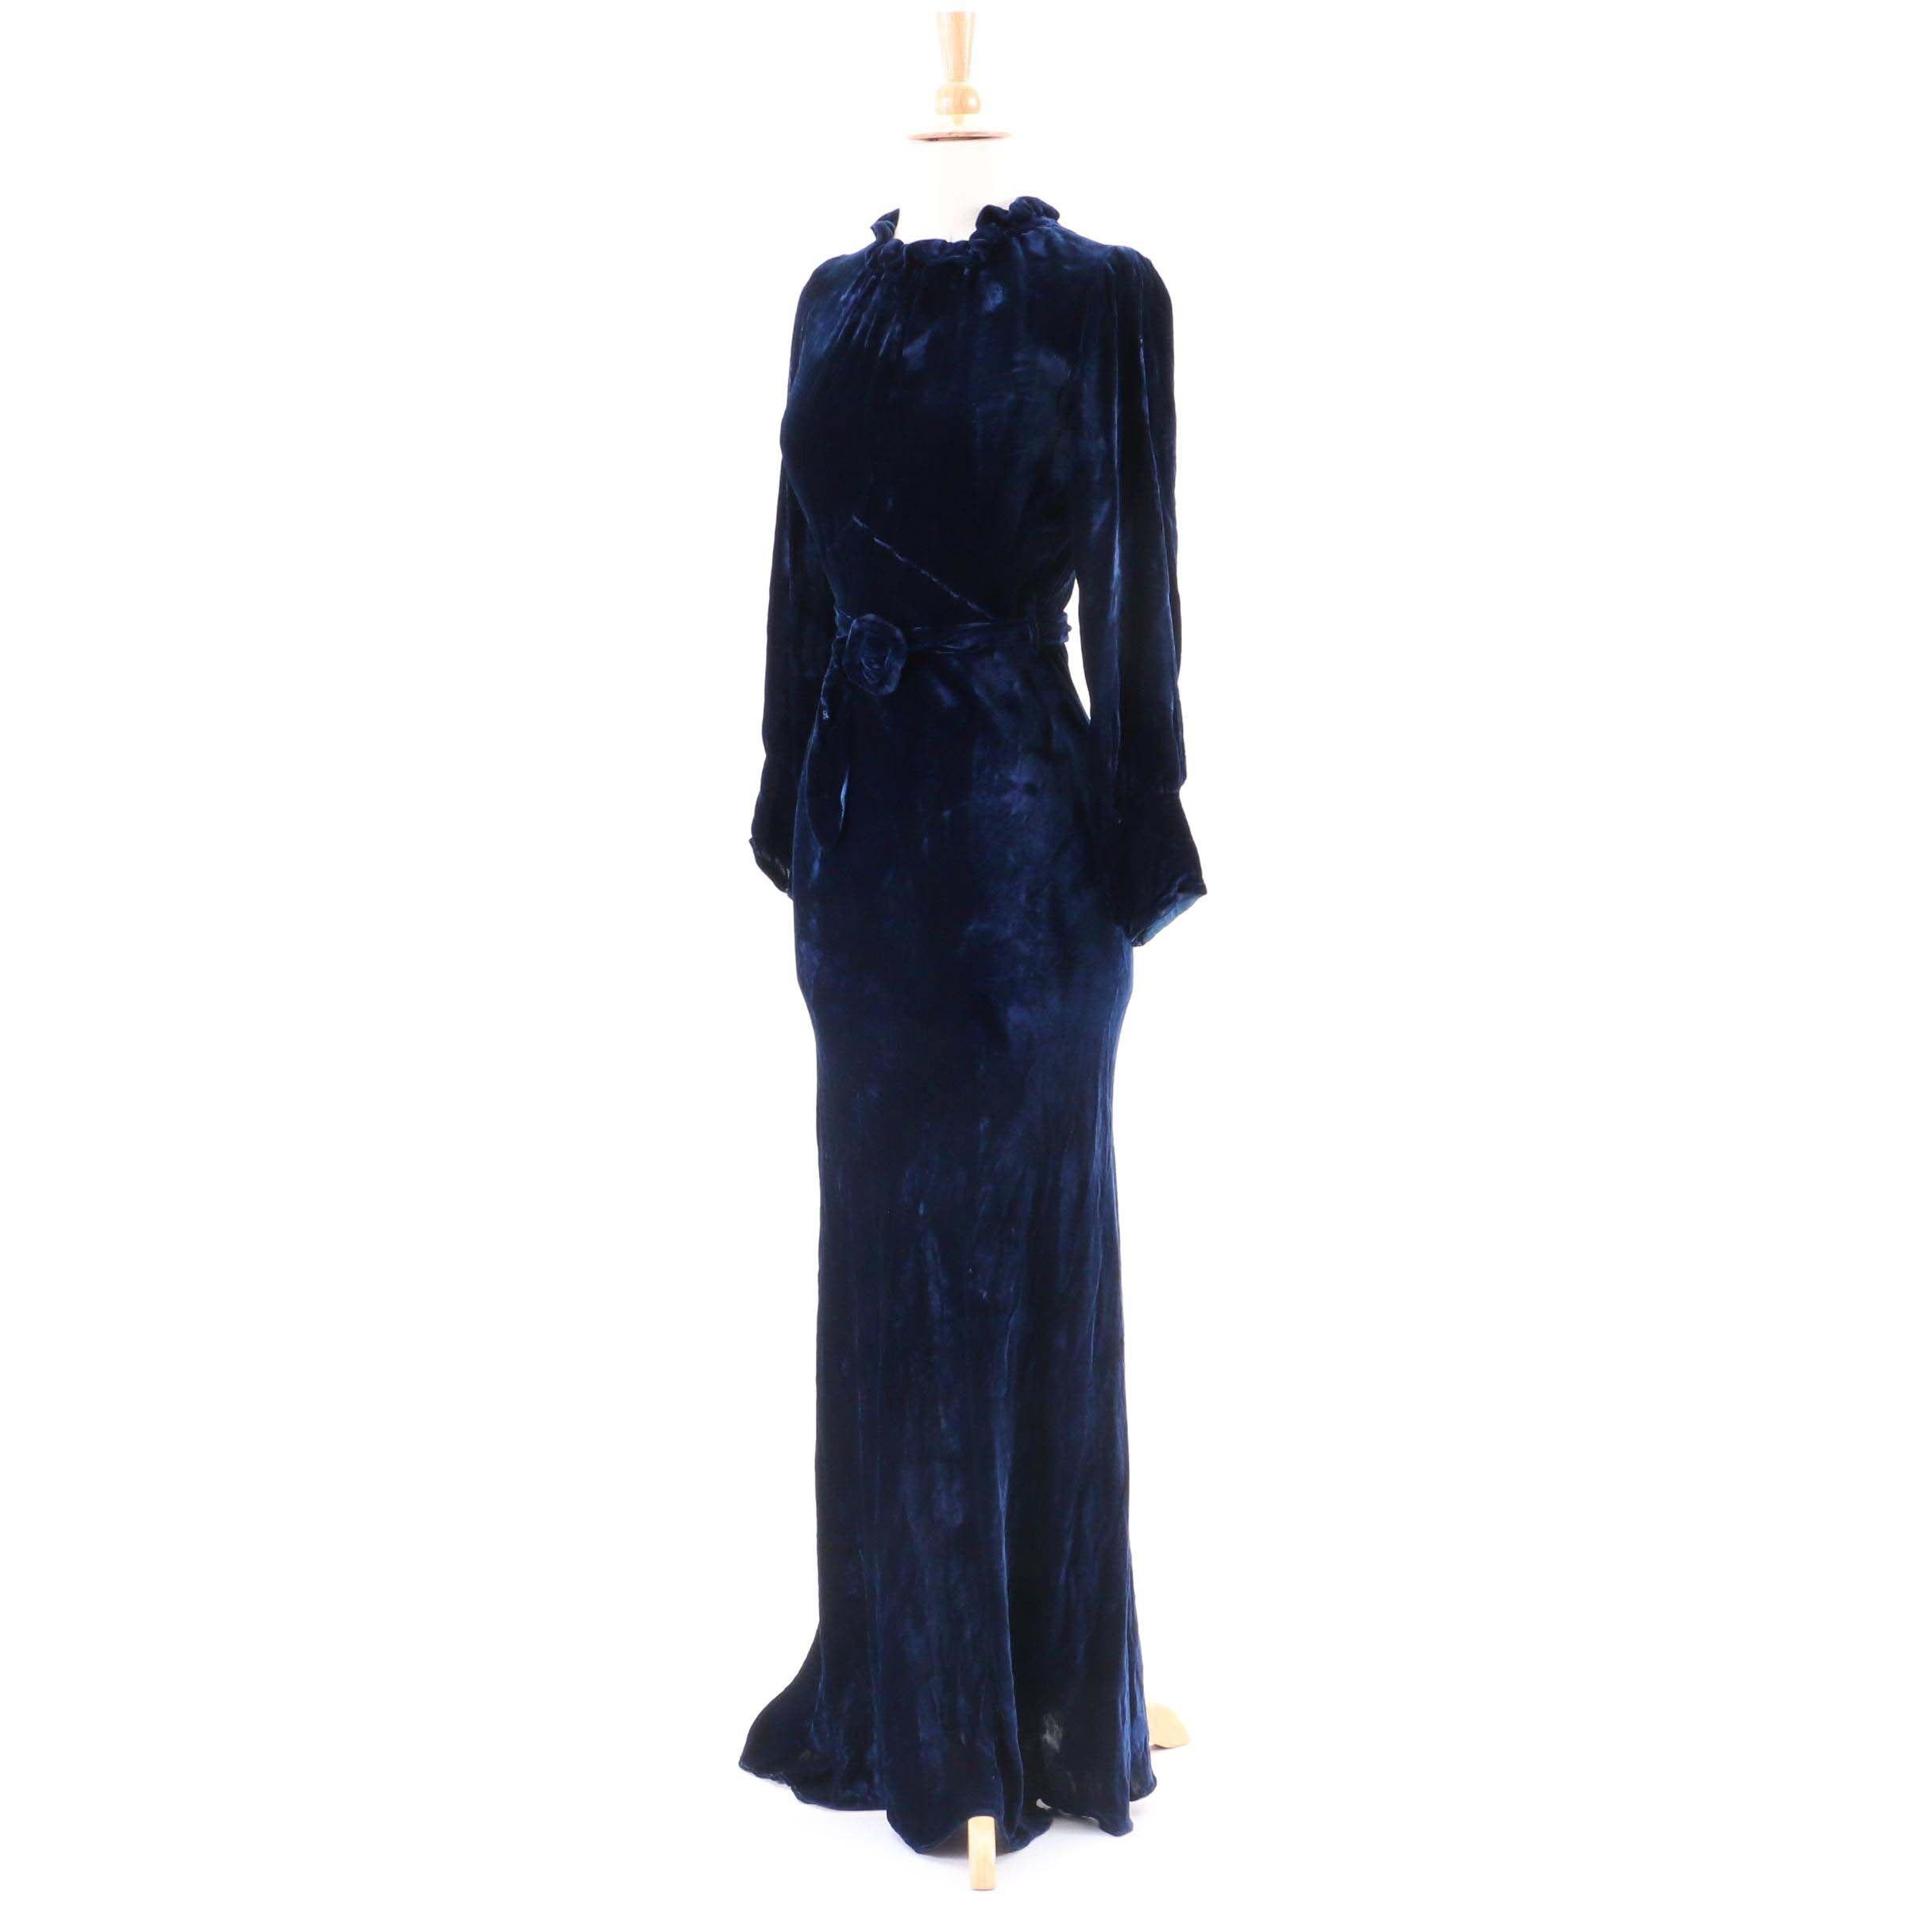 Circa 1930s Vintage Blue Velvet Gown